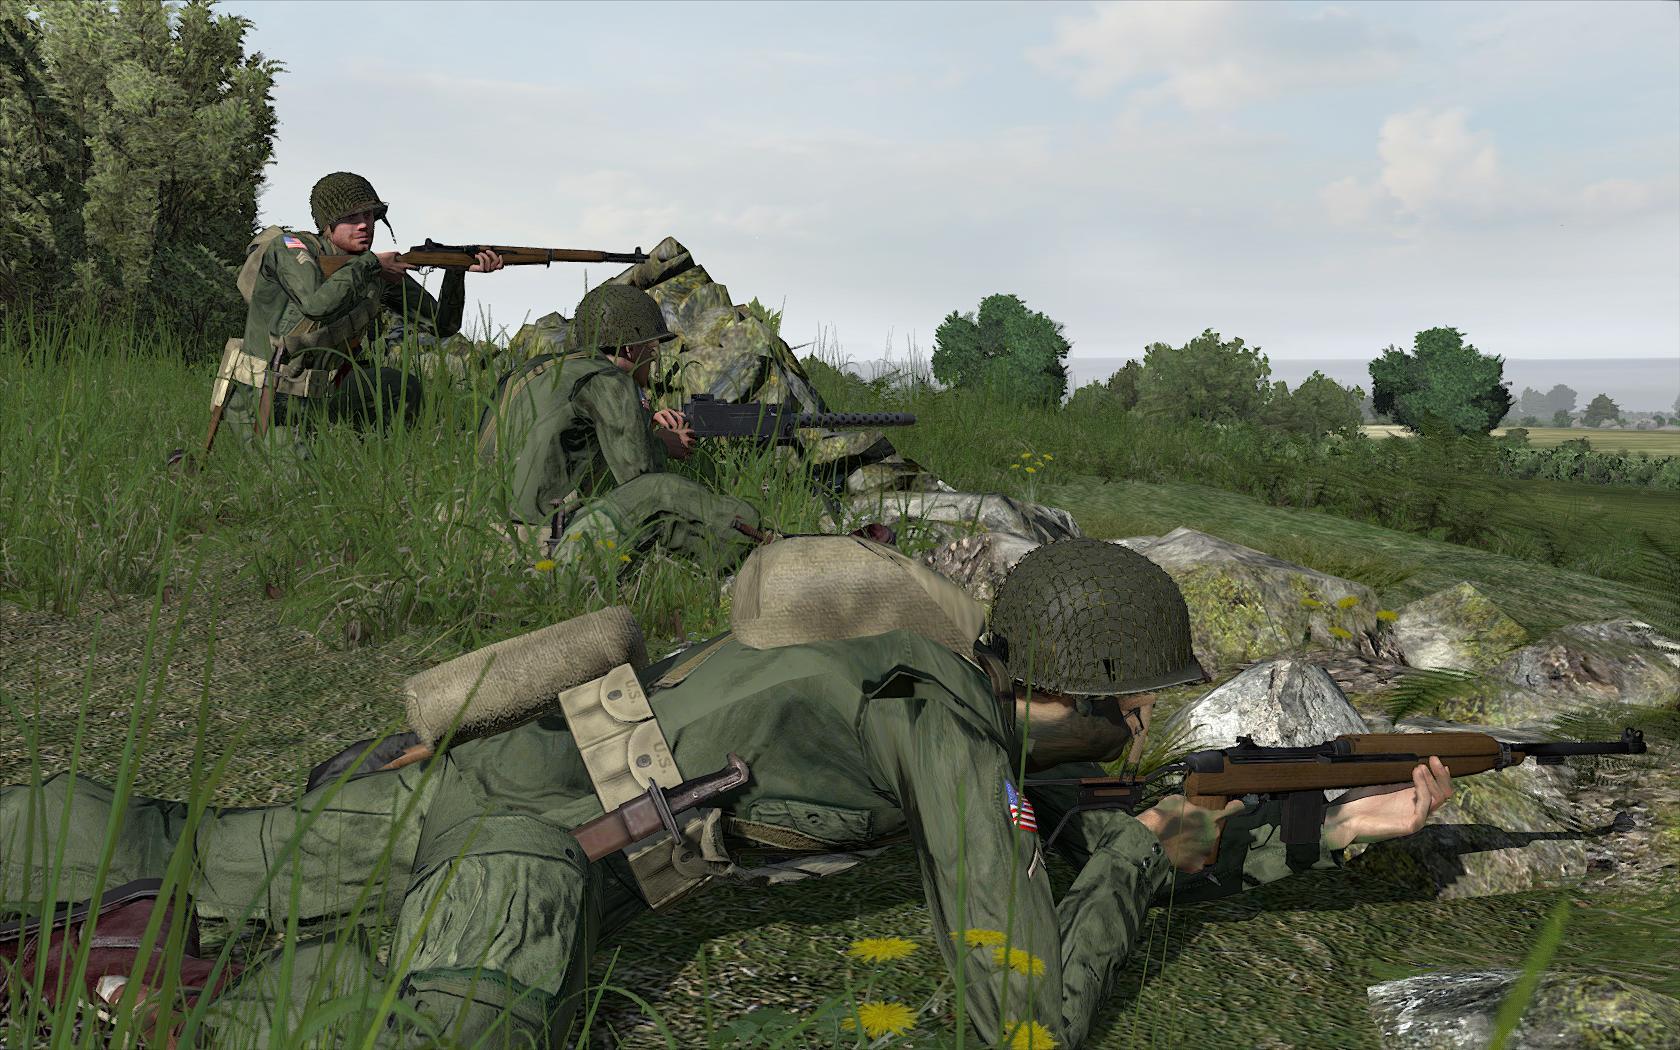 HQ ARMA 2 Wallpapers | File 311.37Kb